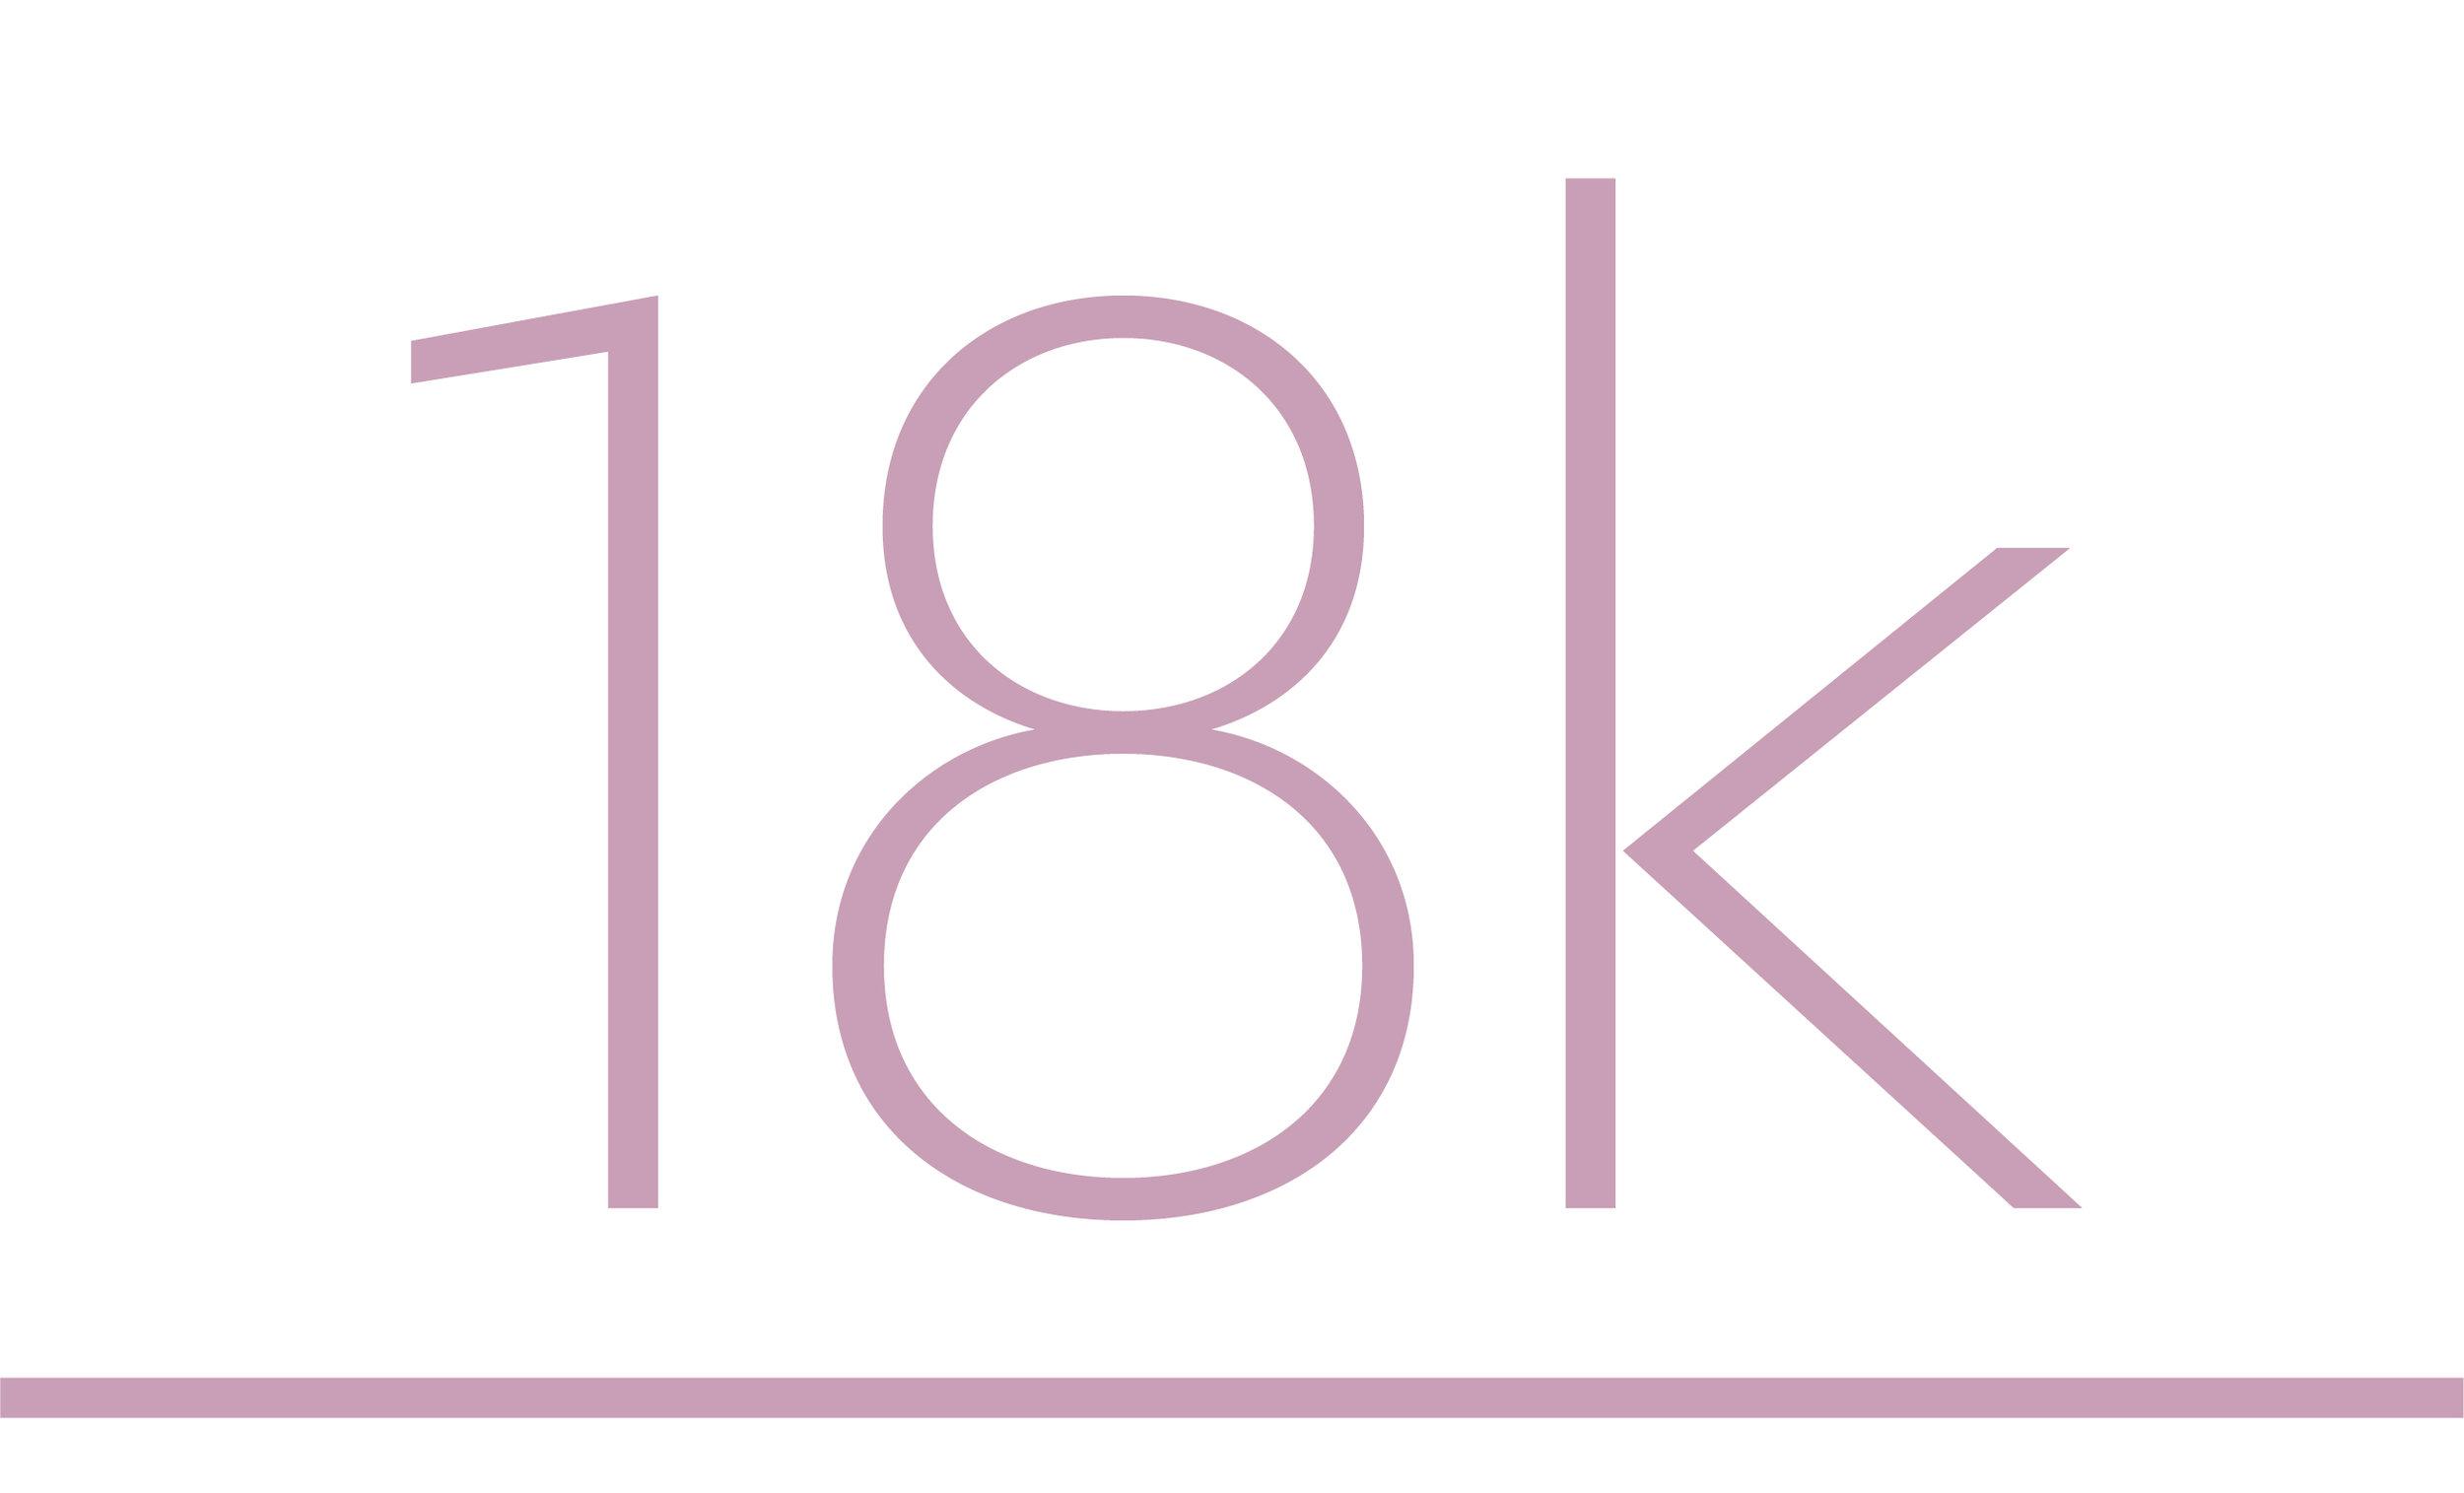 18k.jpg